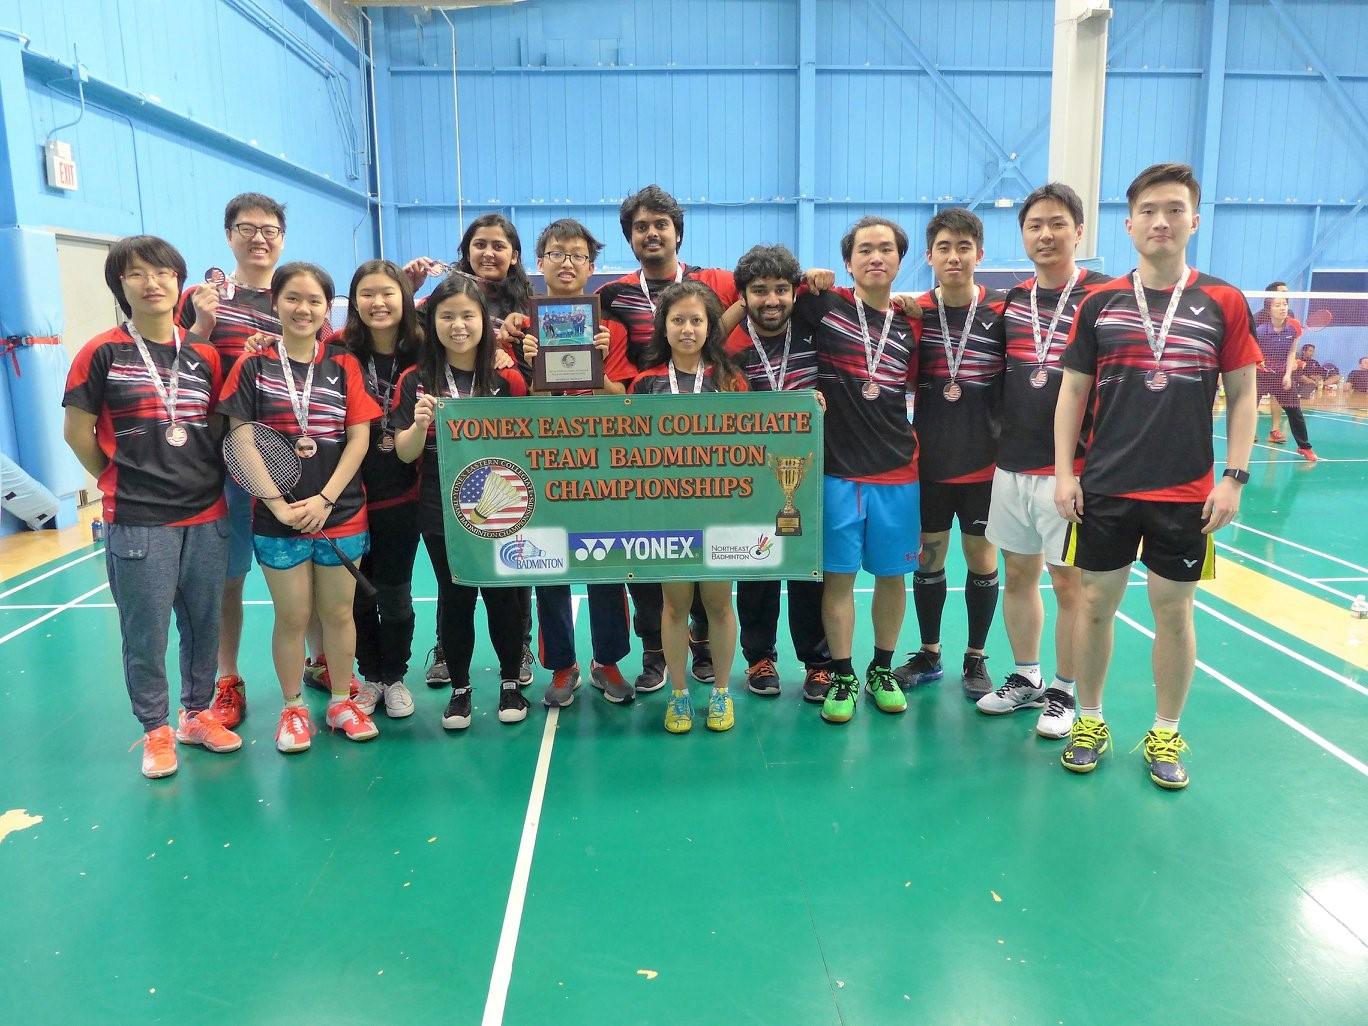 Credit: CMU Badminton Club